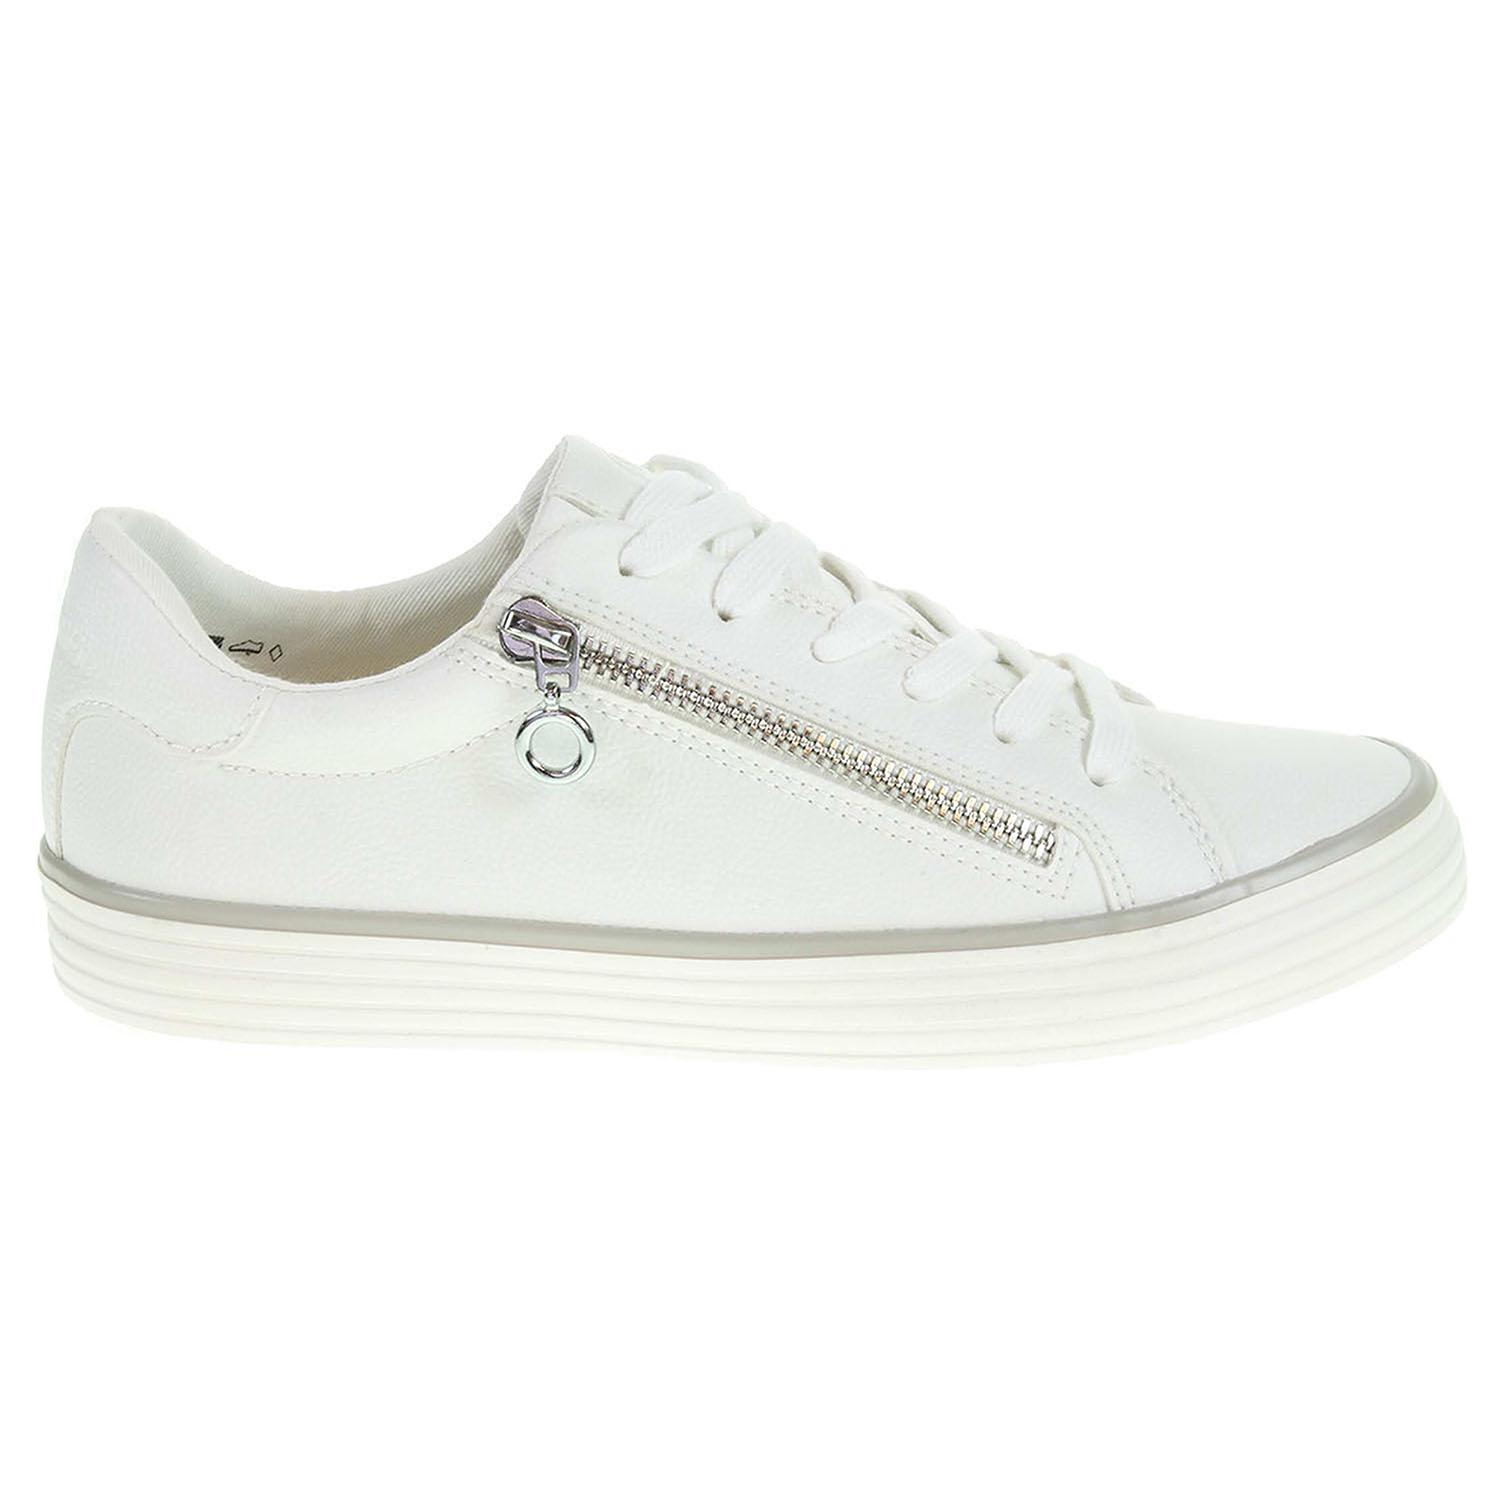 s.Oliver dámská obuv 5-23615-38 bílá 38 bílá bílá